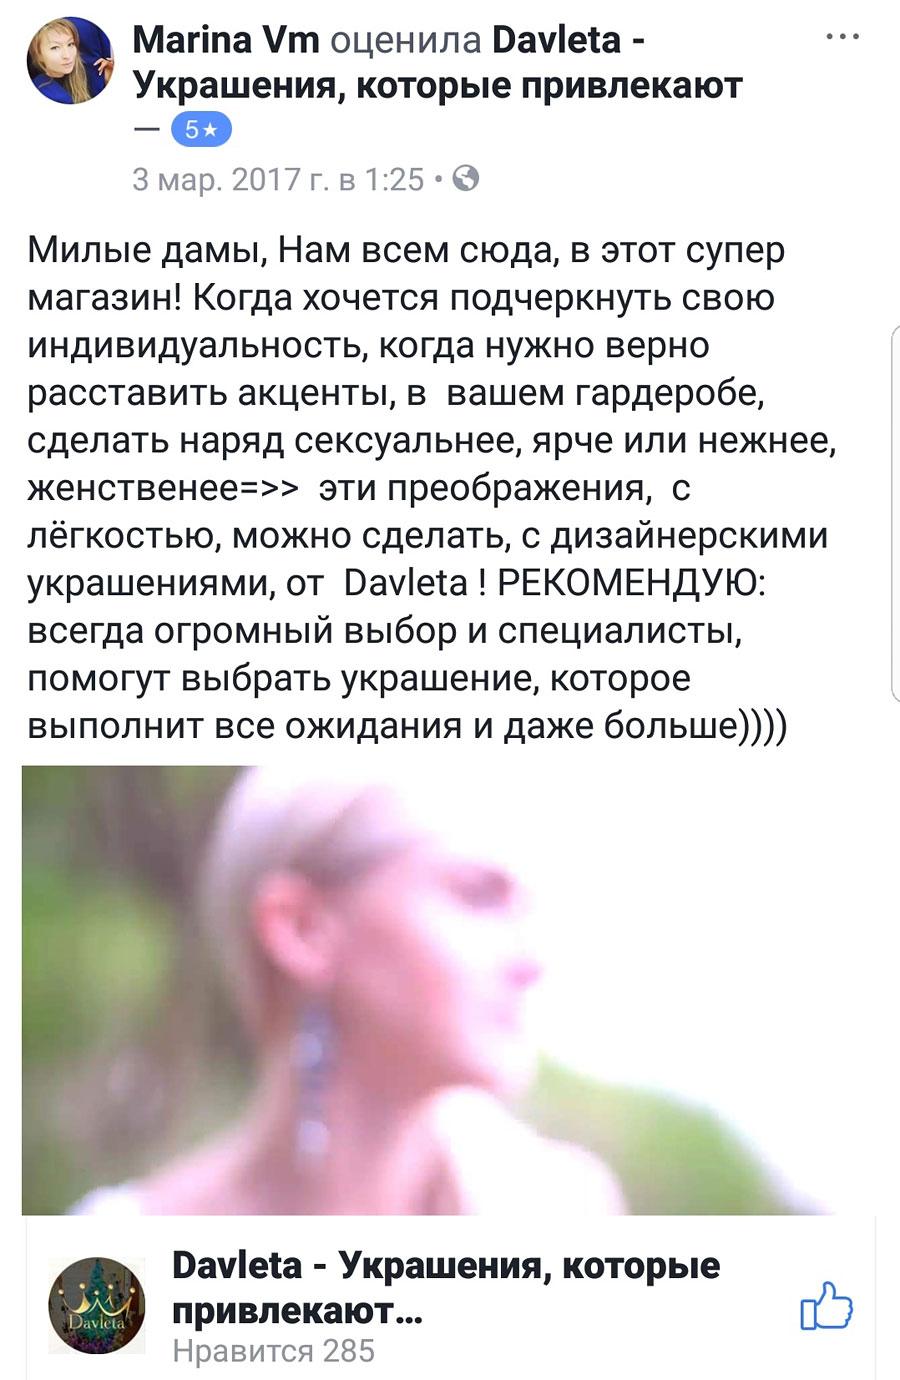 Отзыв стилиста Марина Vm